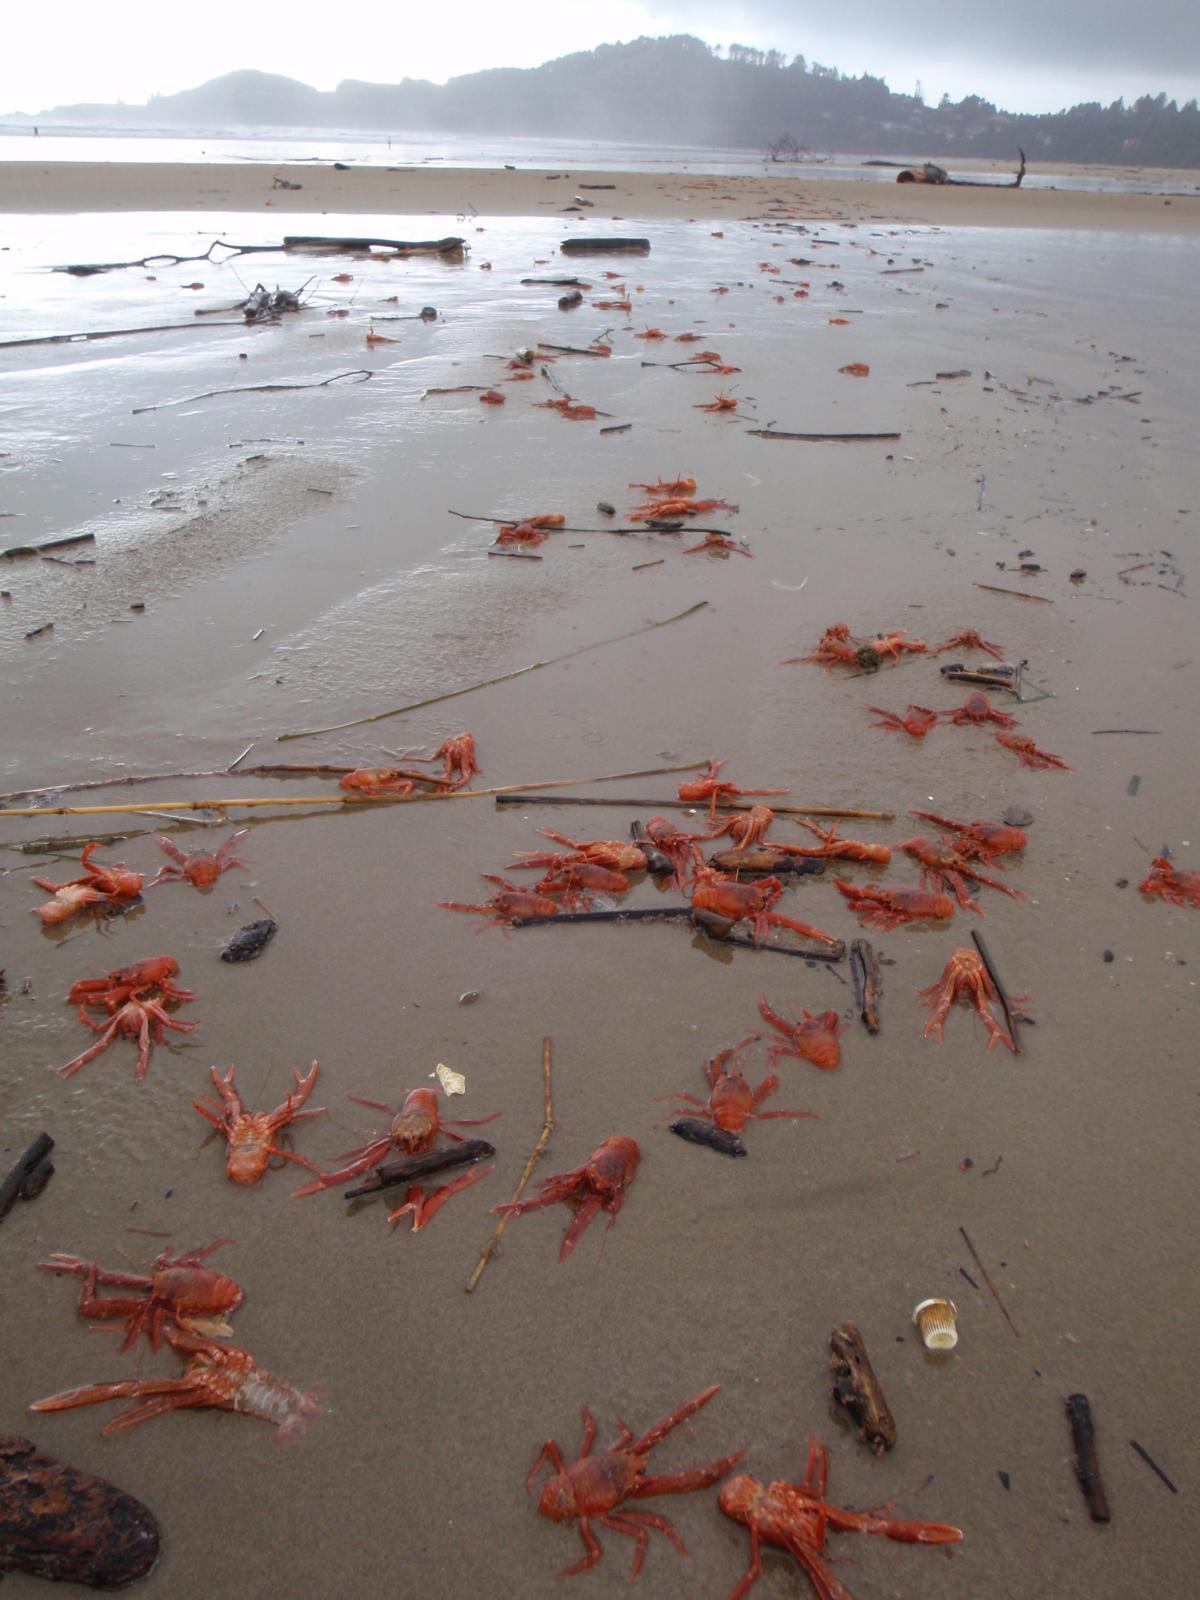 Pelagic crabs-Pleuroncodes planipes